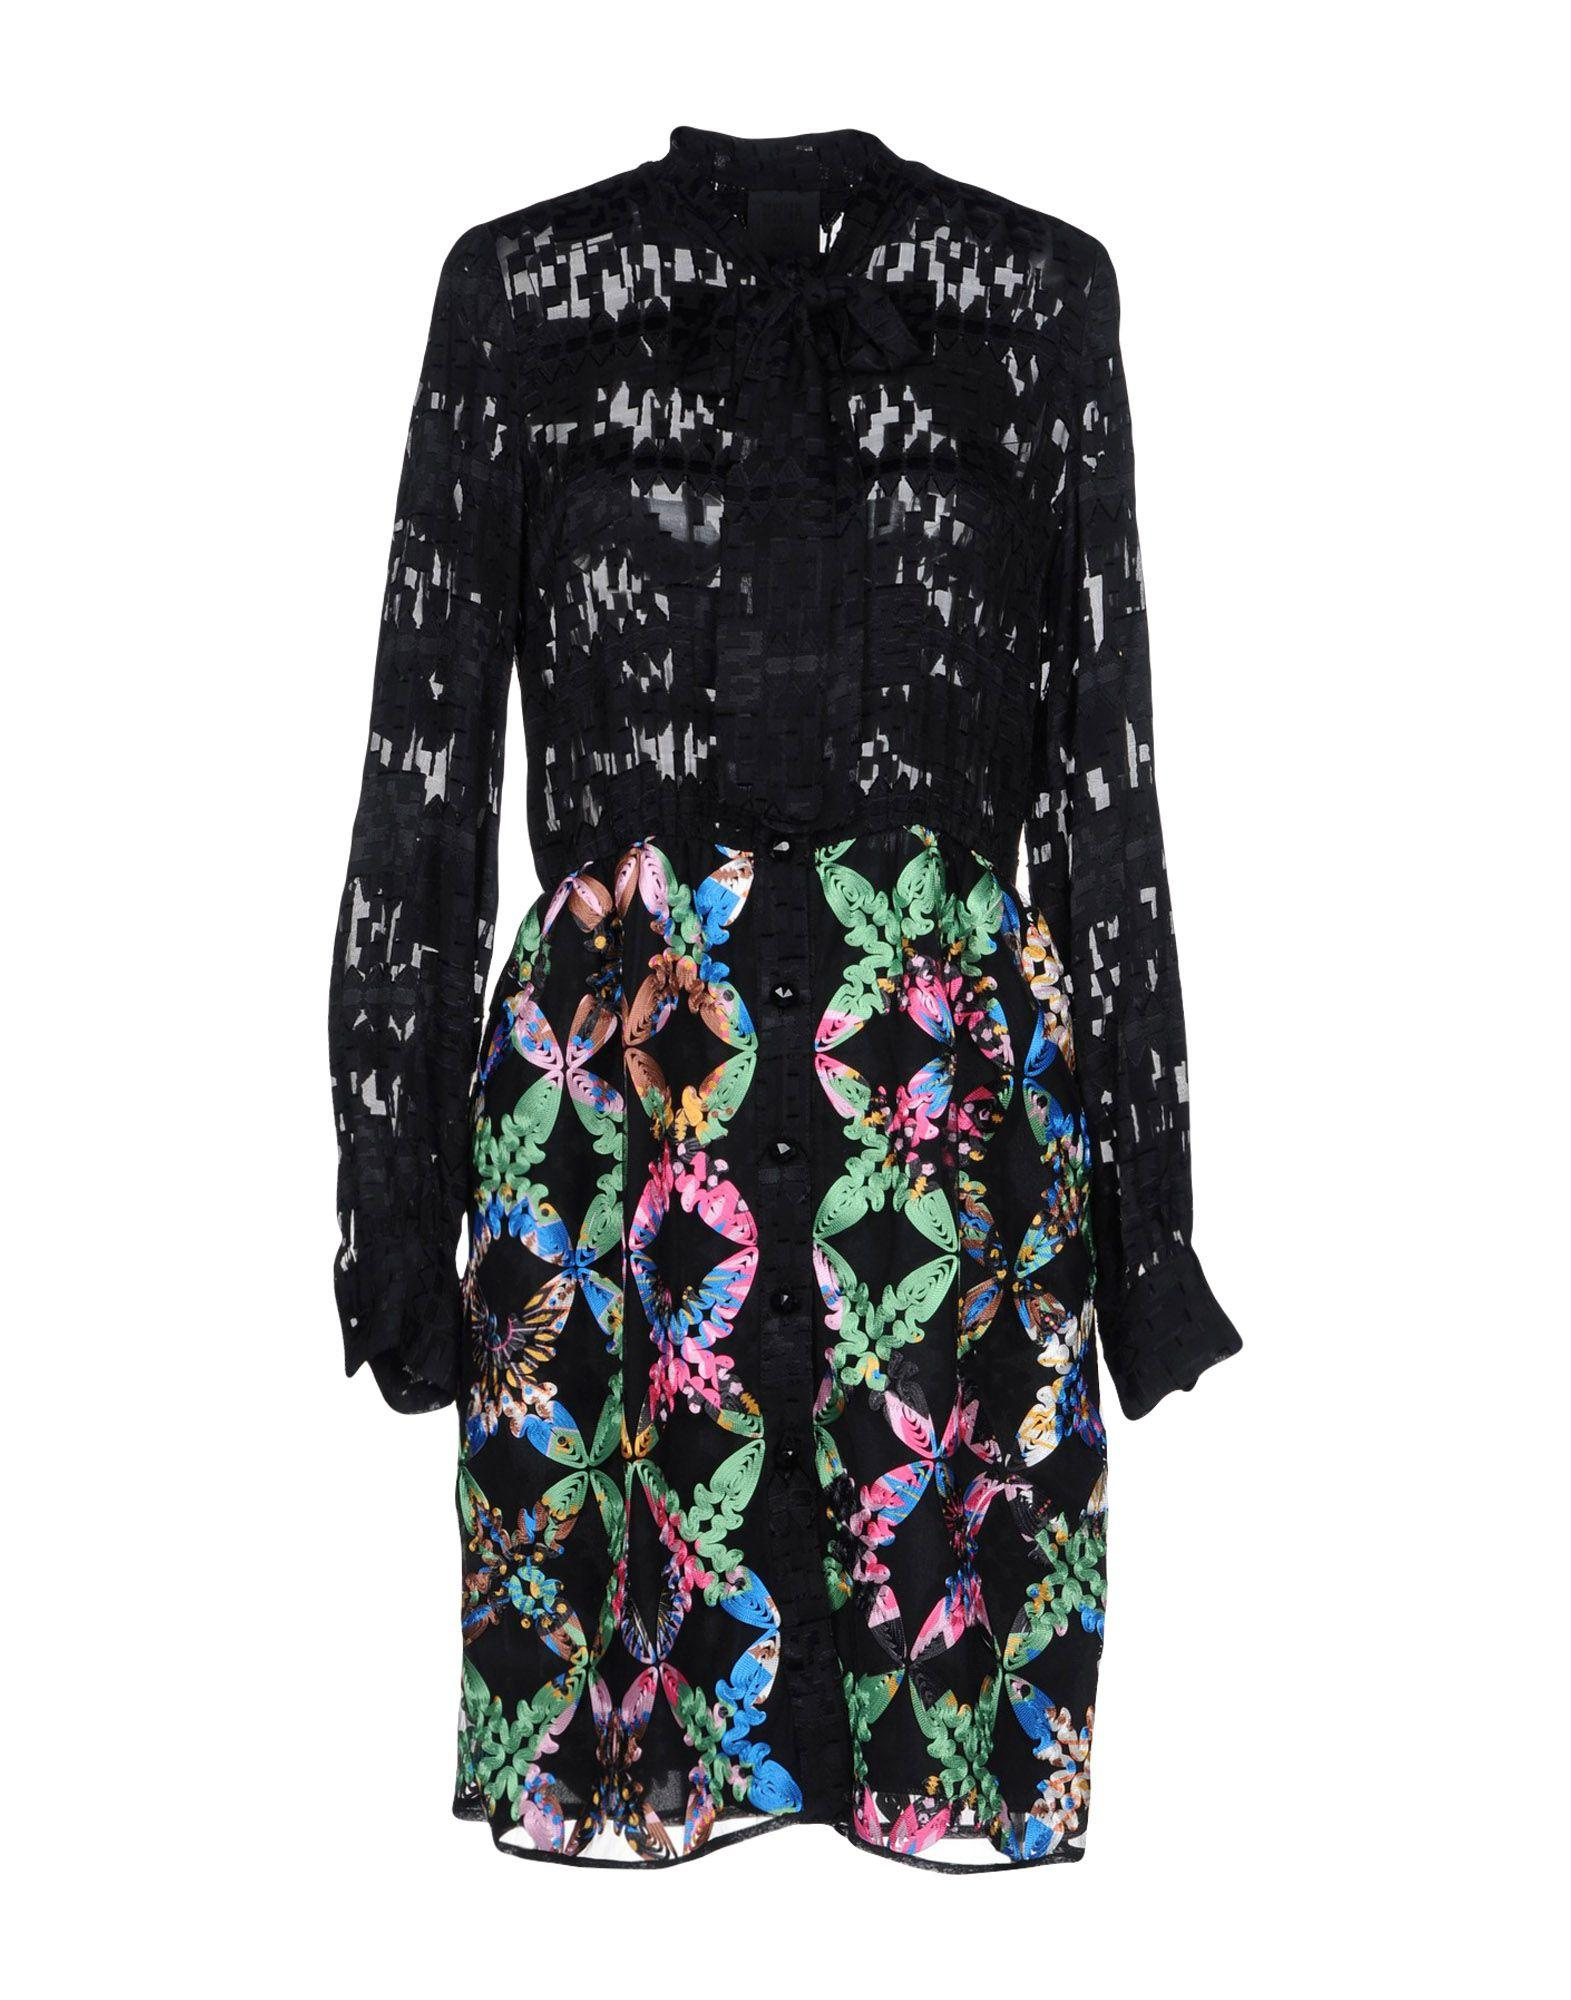 Anna Sui Short Dresses In Black